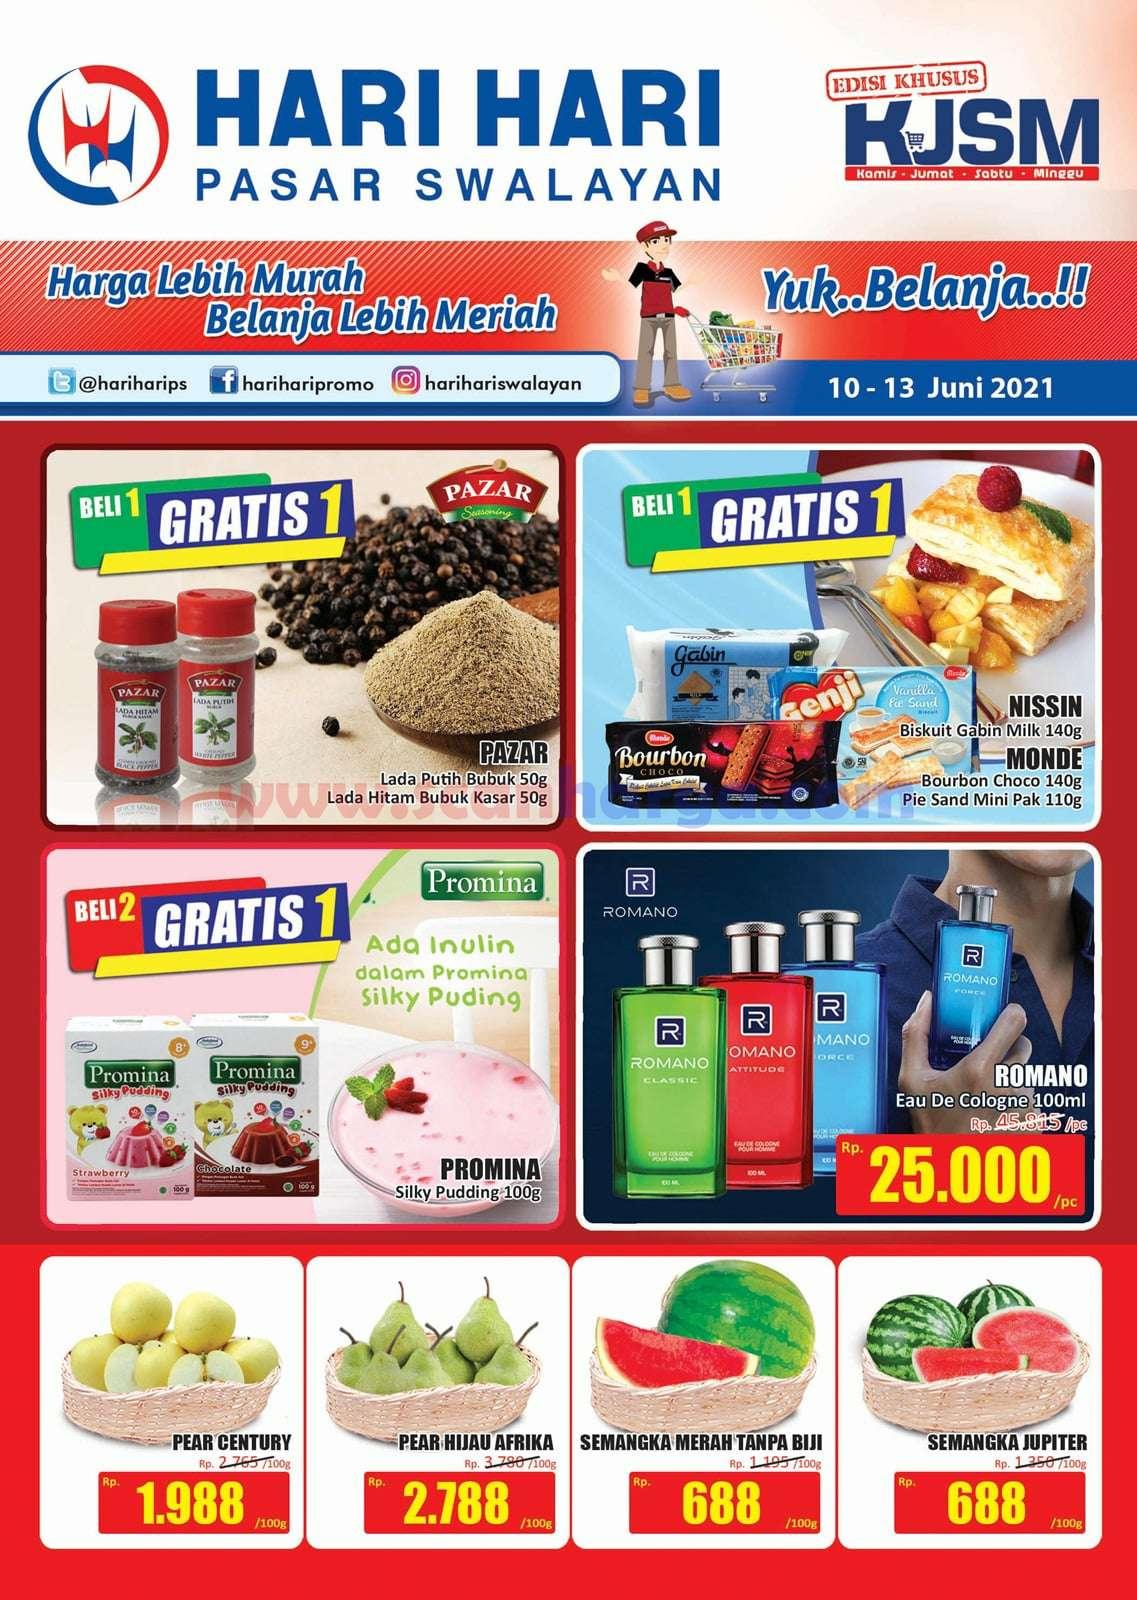 Katalog Promo JSM Hari Hari Swalayan Weekend 10 - 13 Juni 2021 1